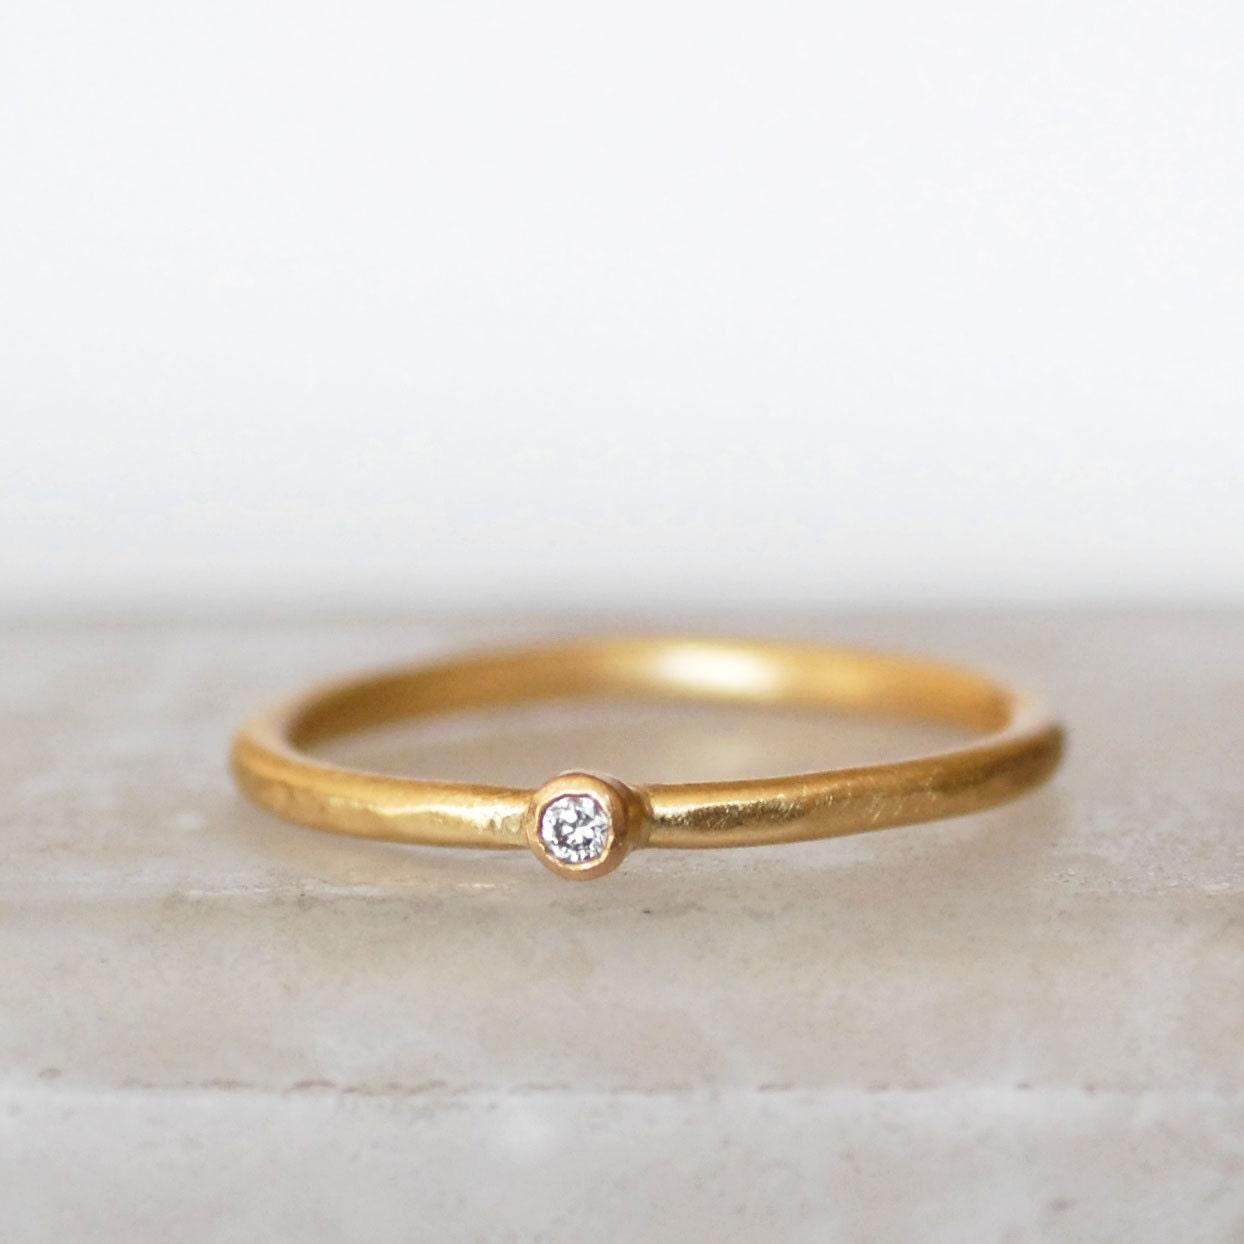 Tiny Diamond Ring 2mm Diamond Ring Small Diamond Gold